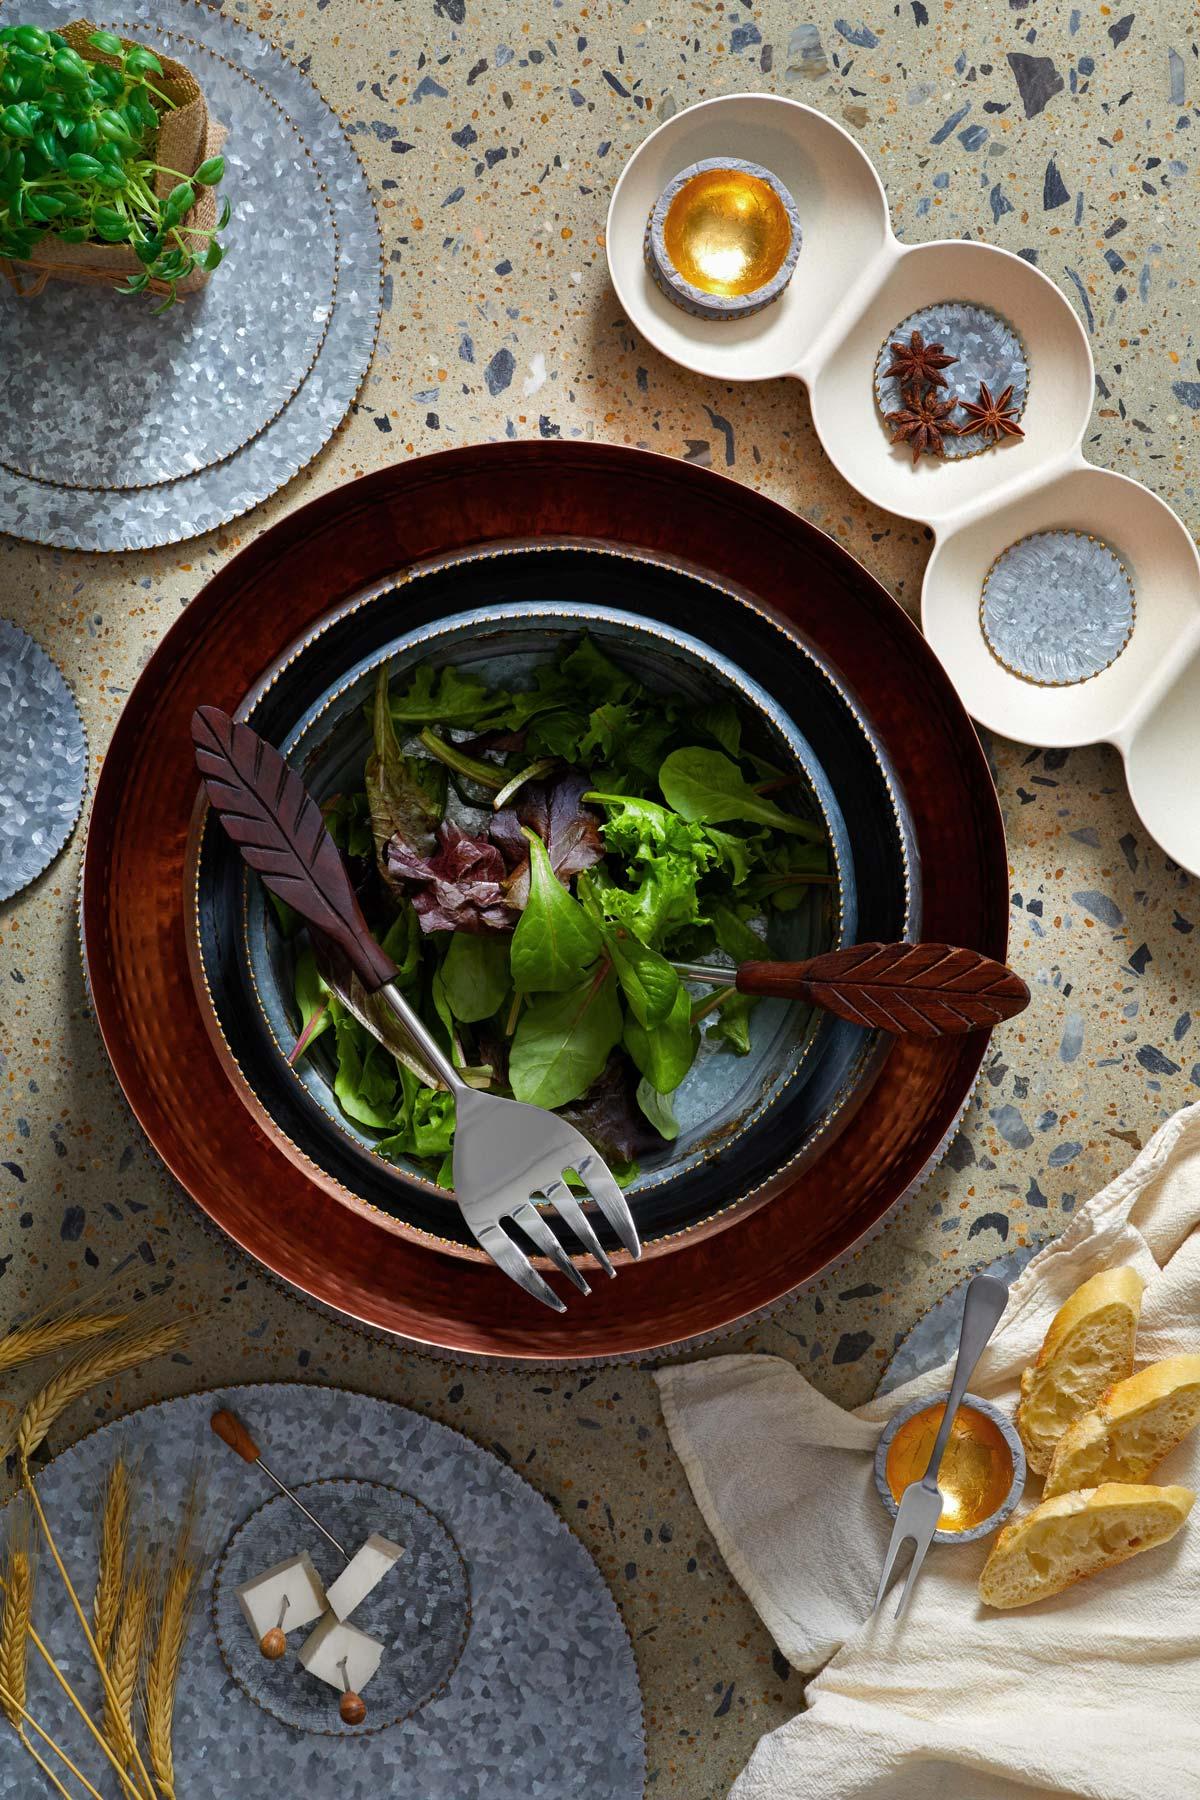 Lifestyle product photography of artisan dinnerware set